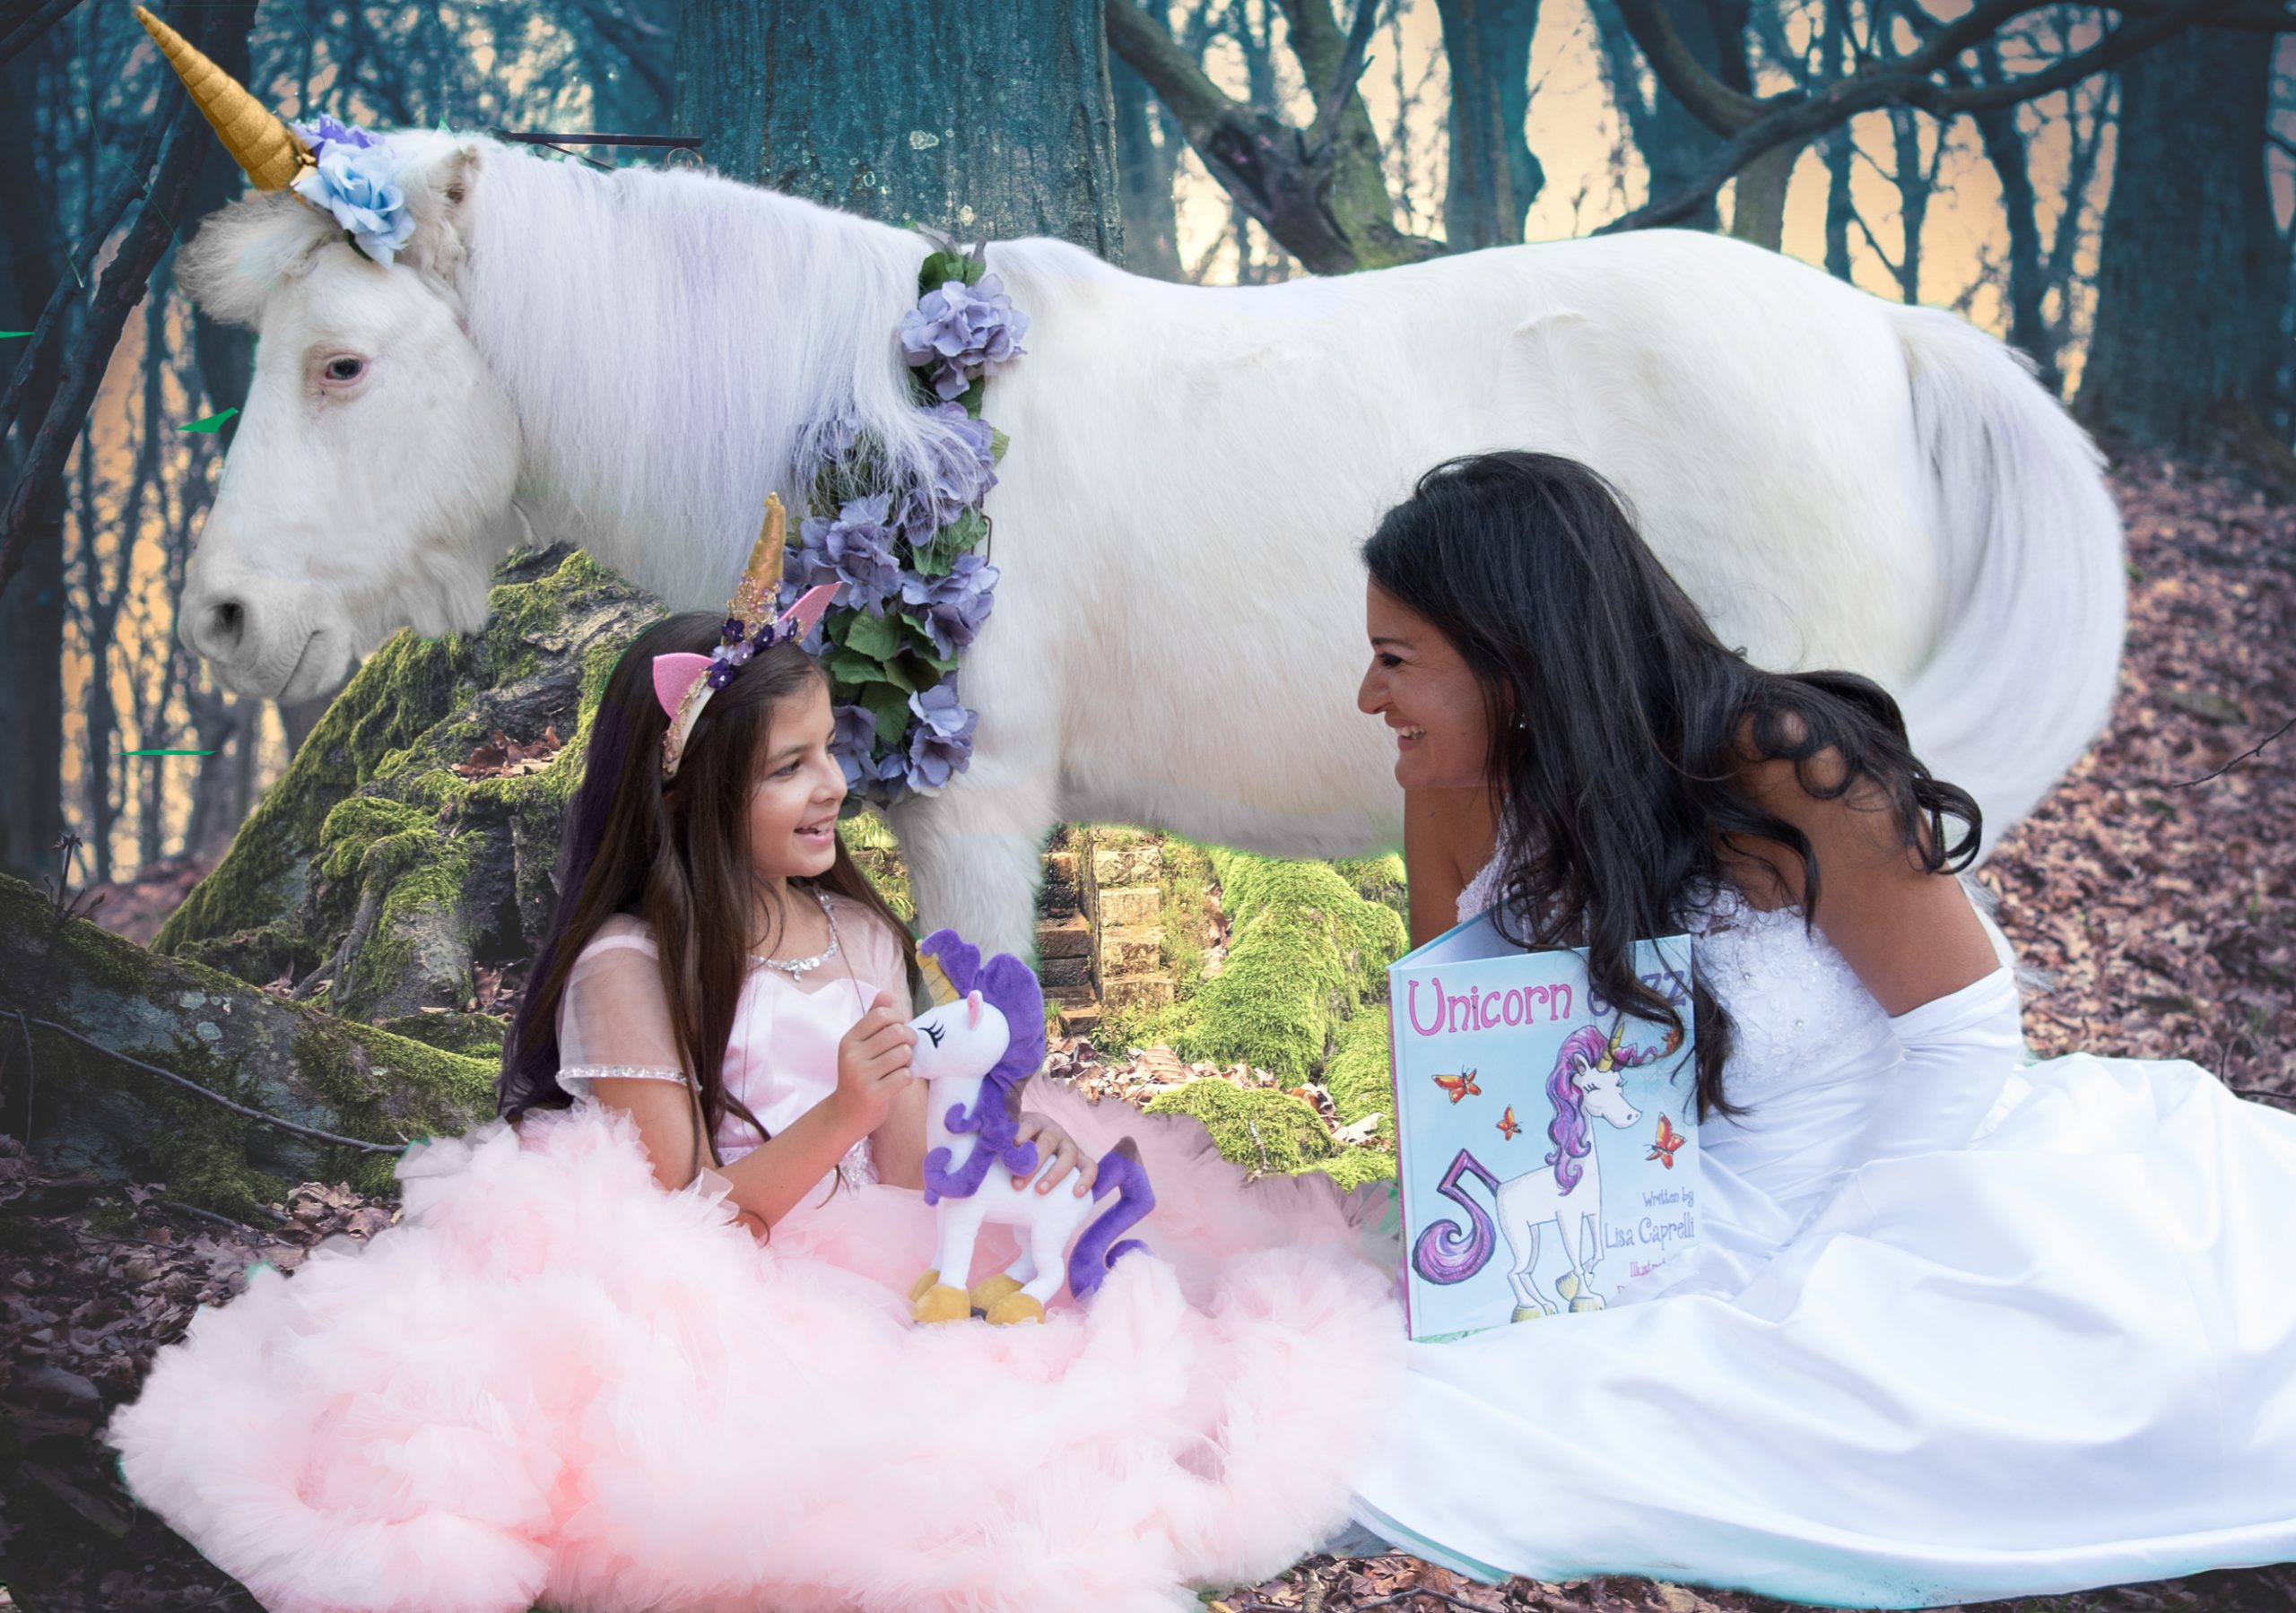 unicorn books for kids series with unicorn jazz plush